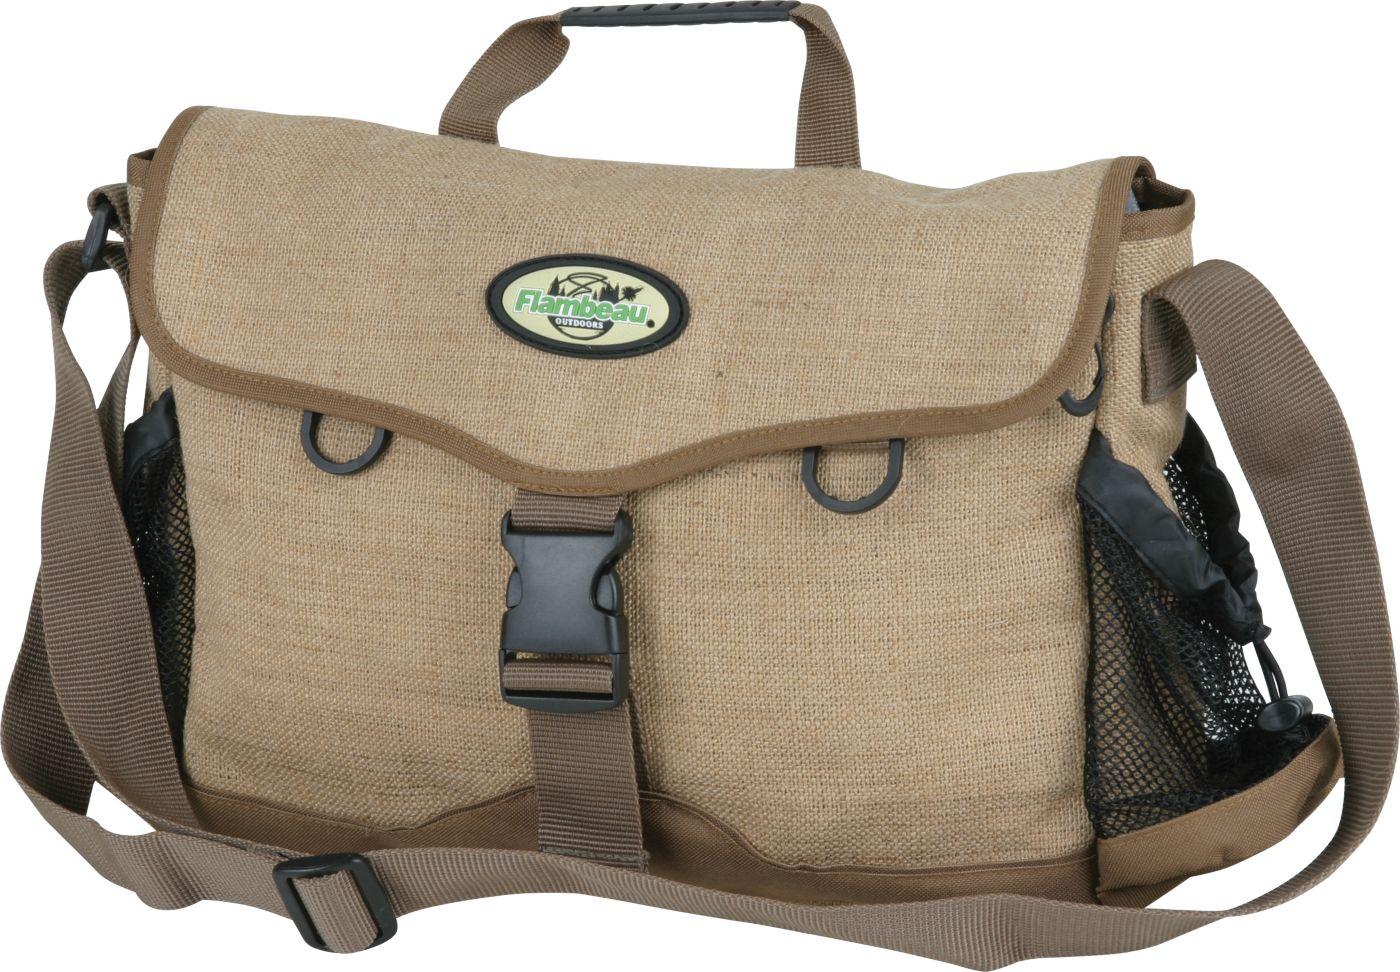 Flambeau Tan Creel Bag